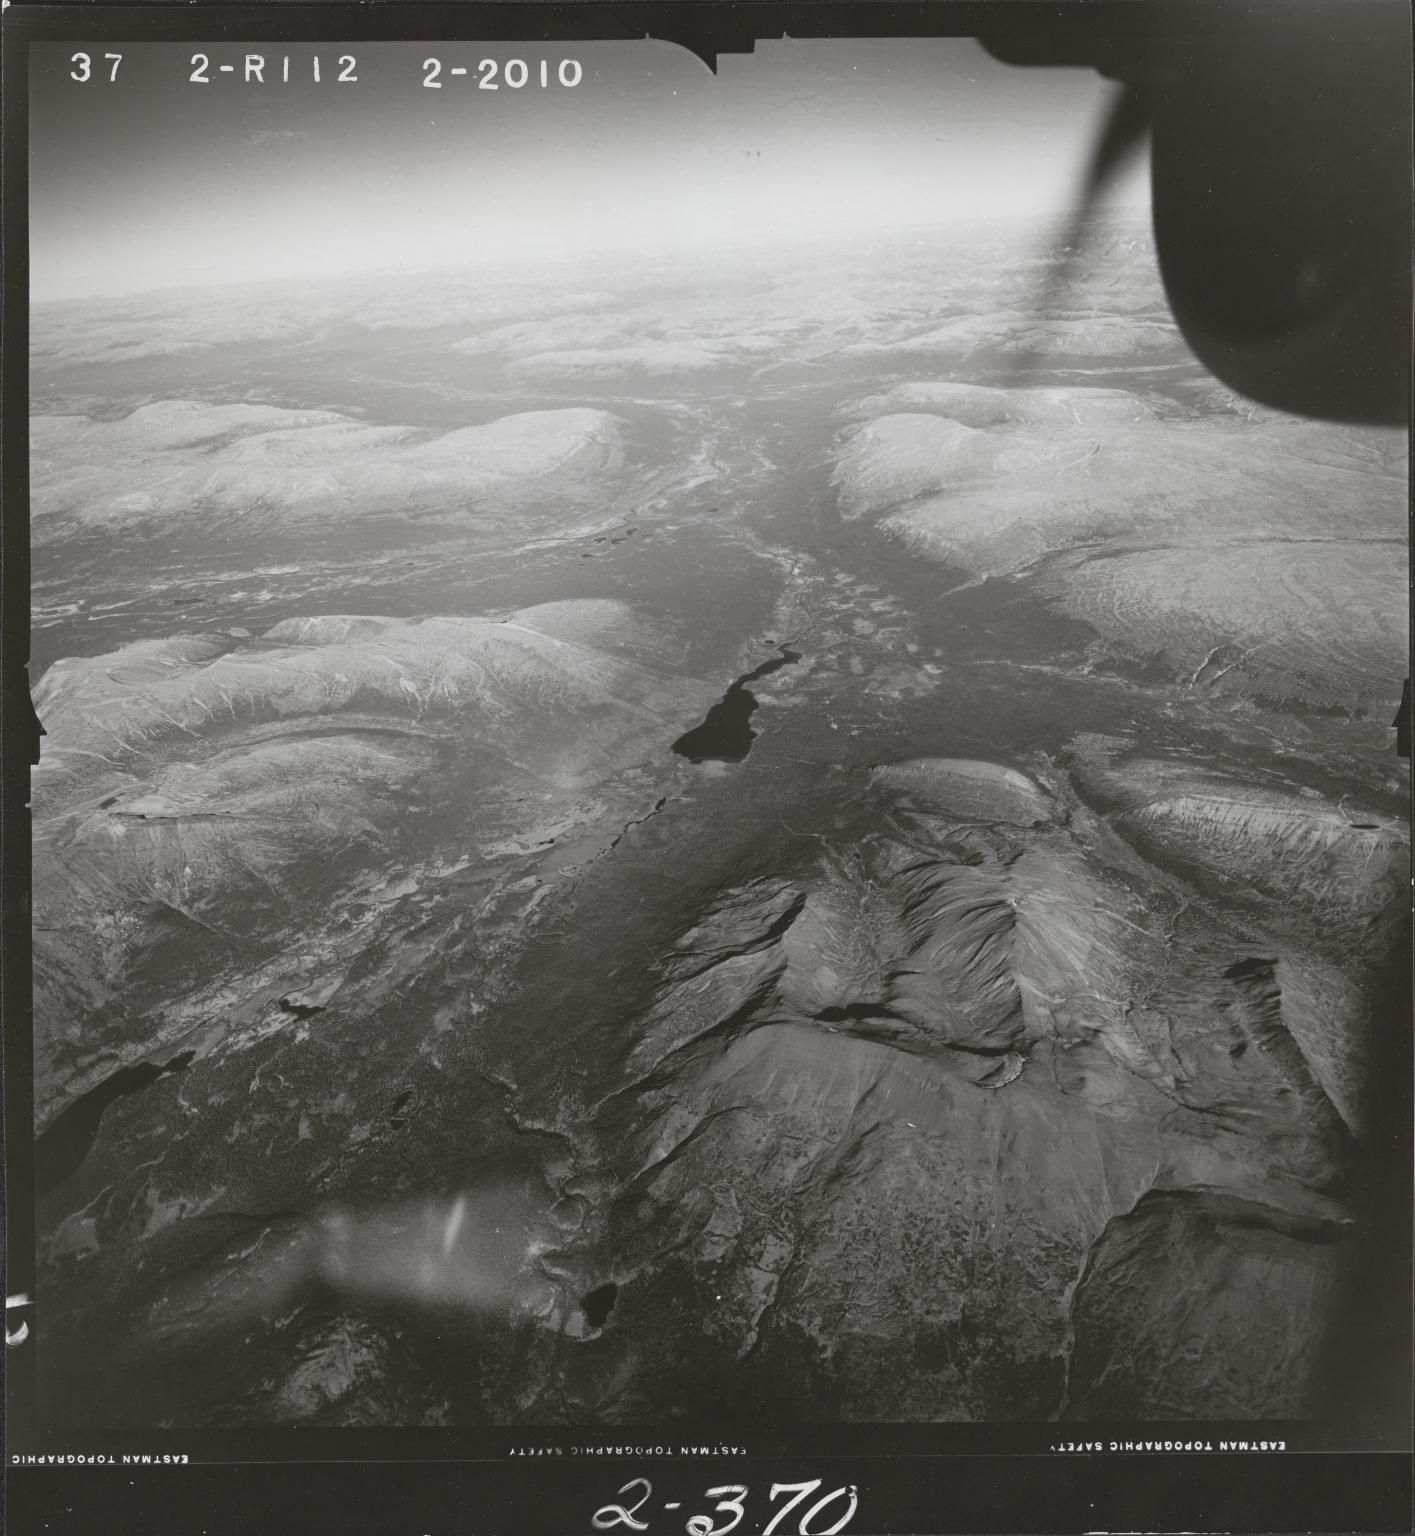 Klappan Range, aerial photograph FL 49 R-112, British Columbia